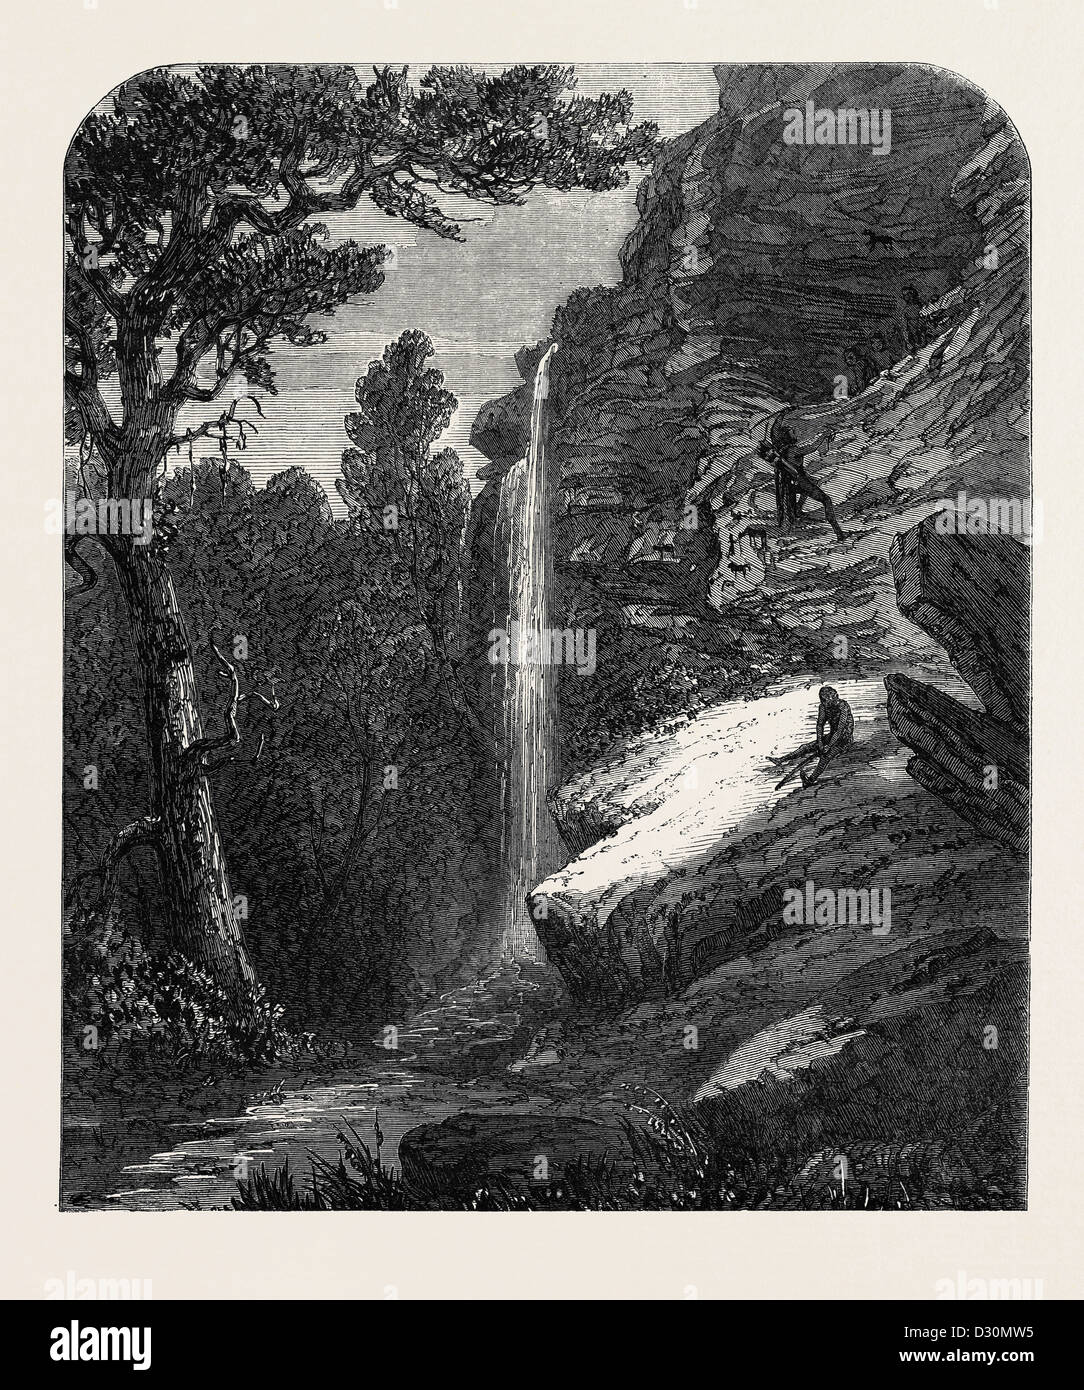 BUSHMAN HÖHLE ELAND BERG KAT RIVER SÜDAFRIKA 1869 Stockbild